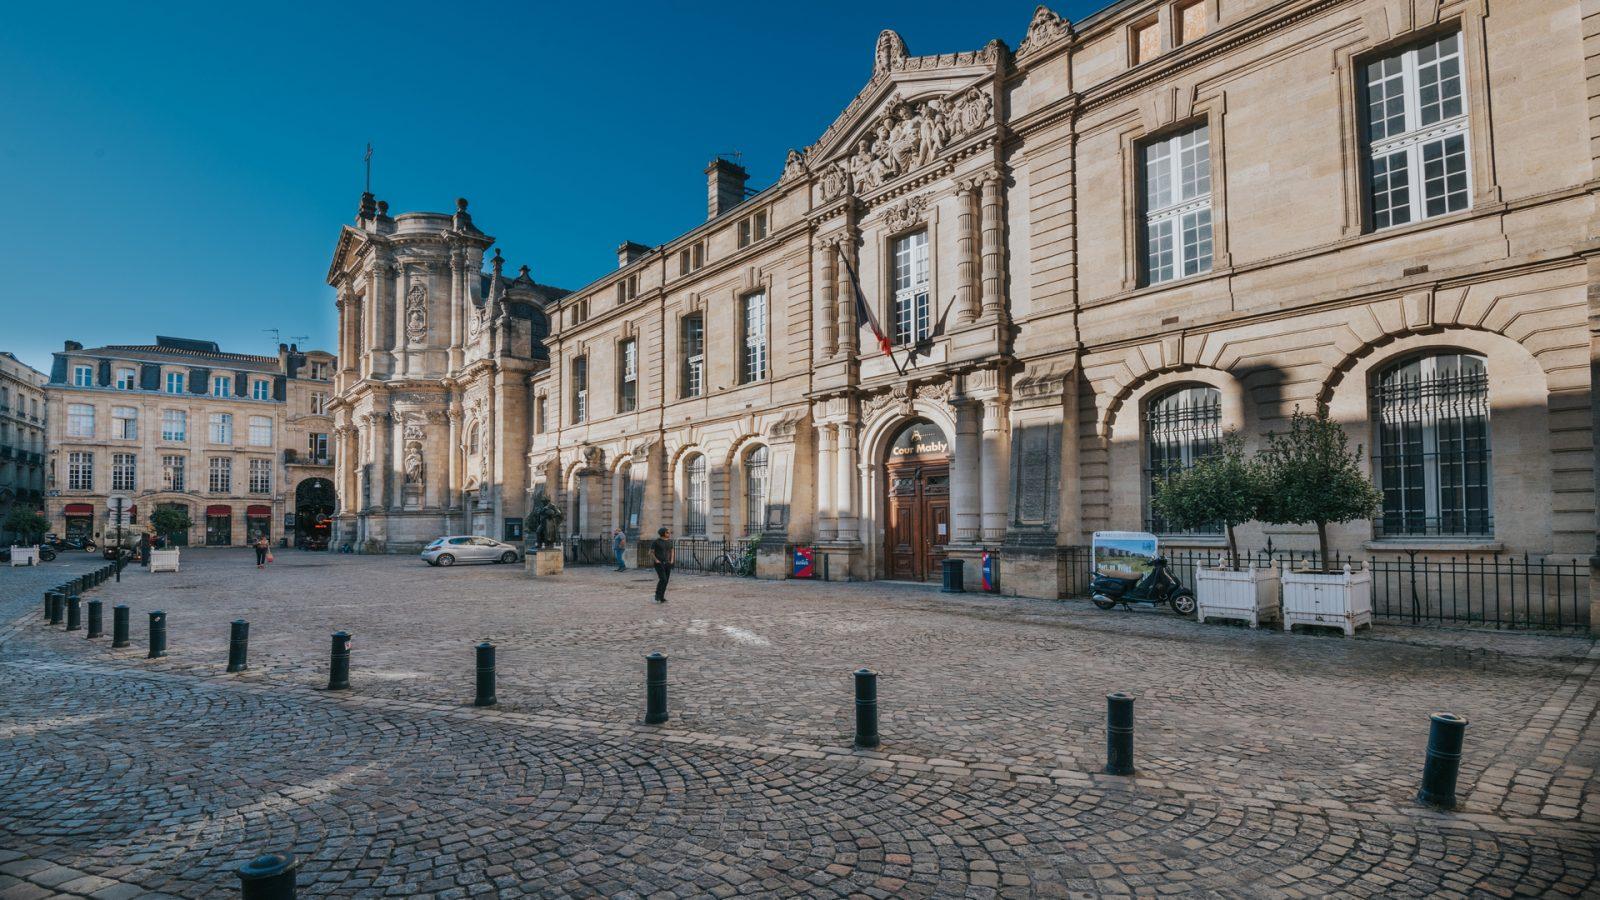 Eglise-Notre-Dame-Nicolas-Duffaure-1-3